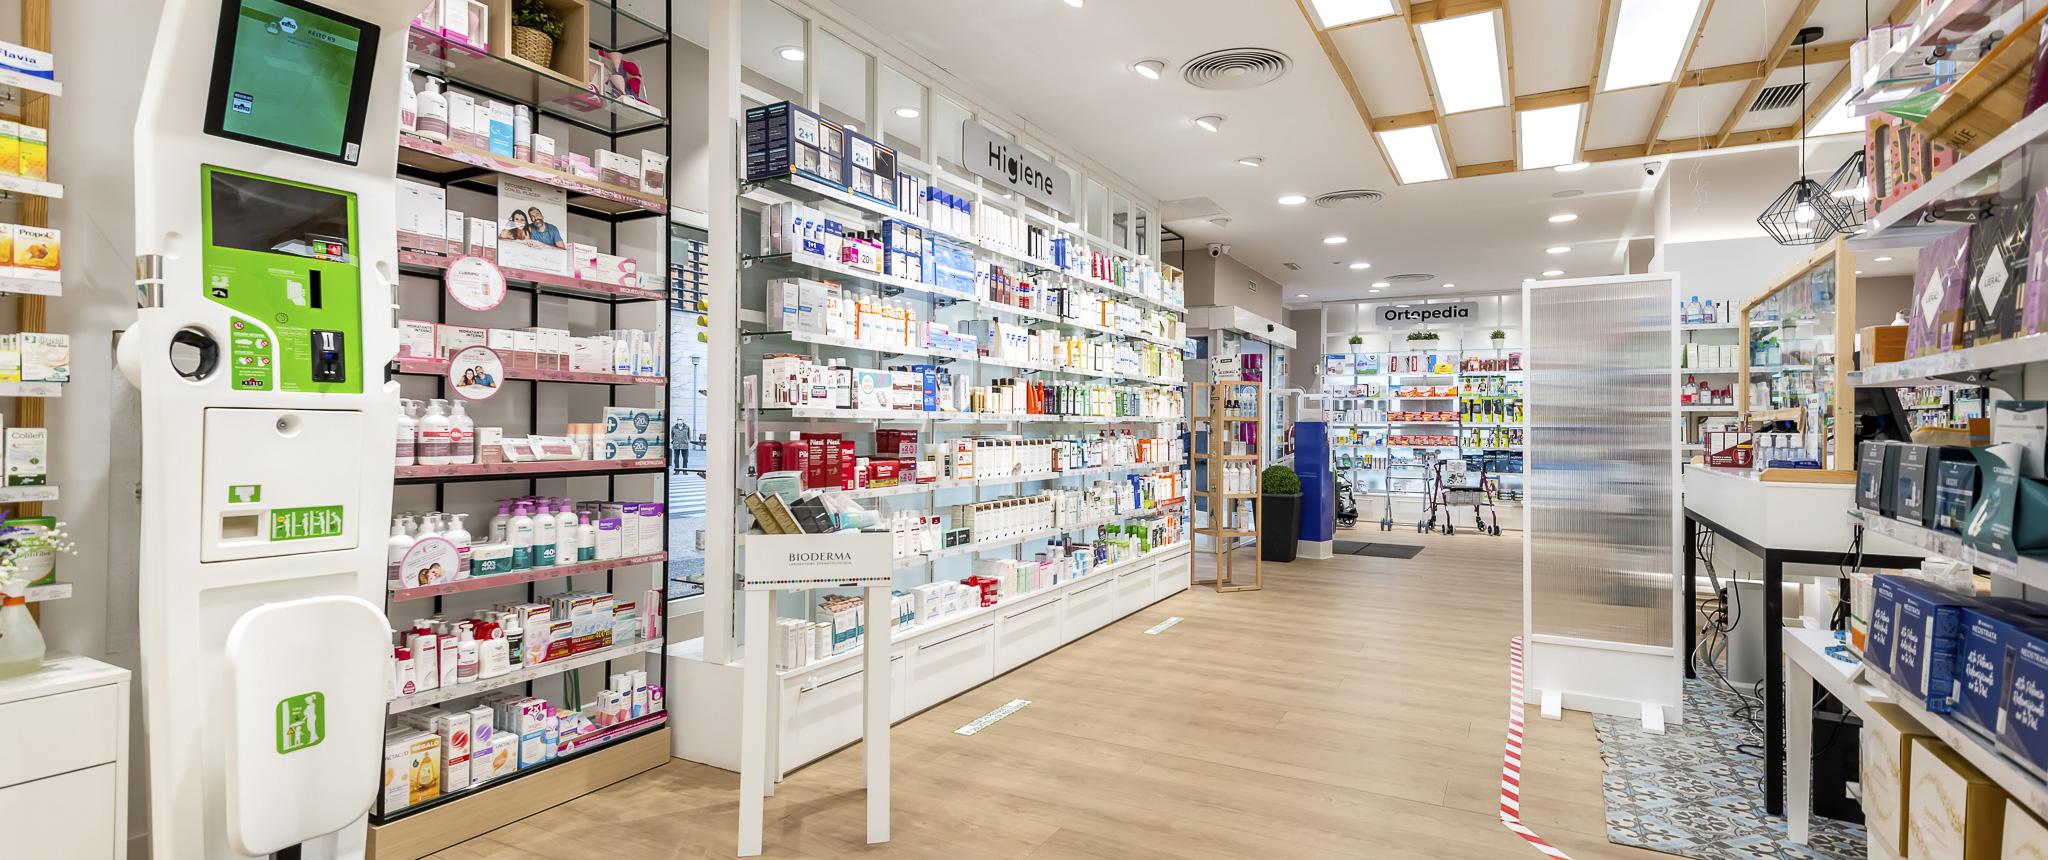 farmacia aragonia interior